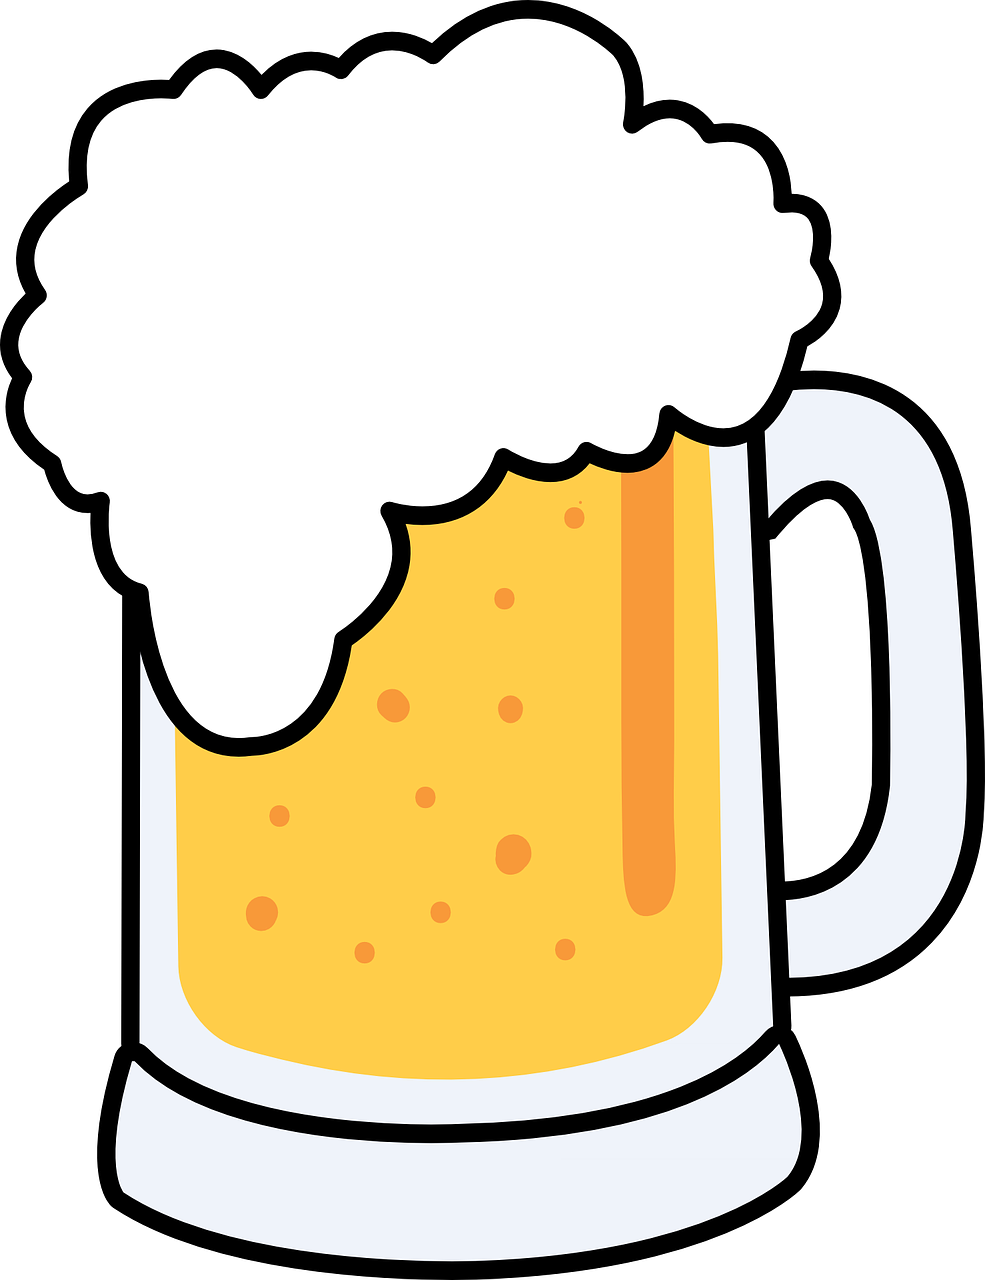 Cigar clipart bourbon glass. Free beer mug download